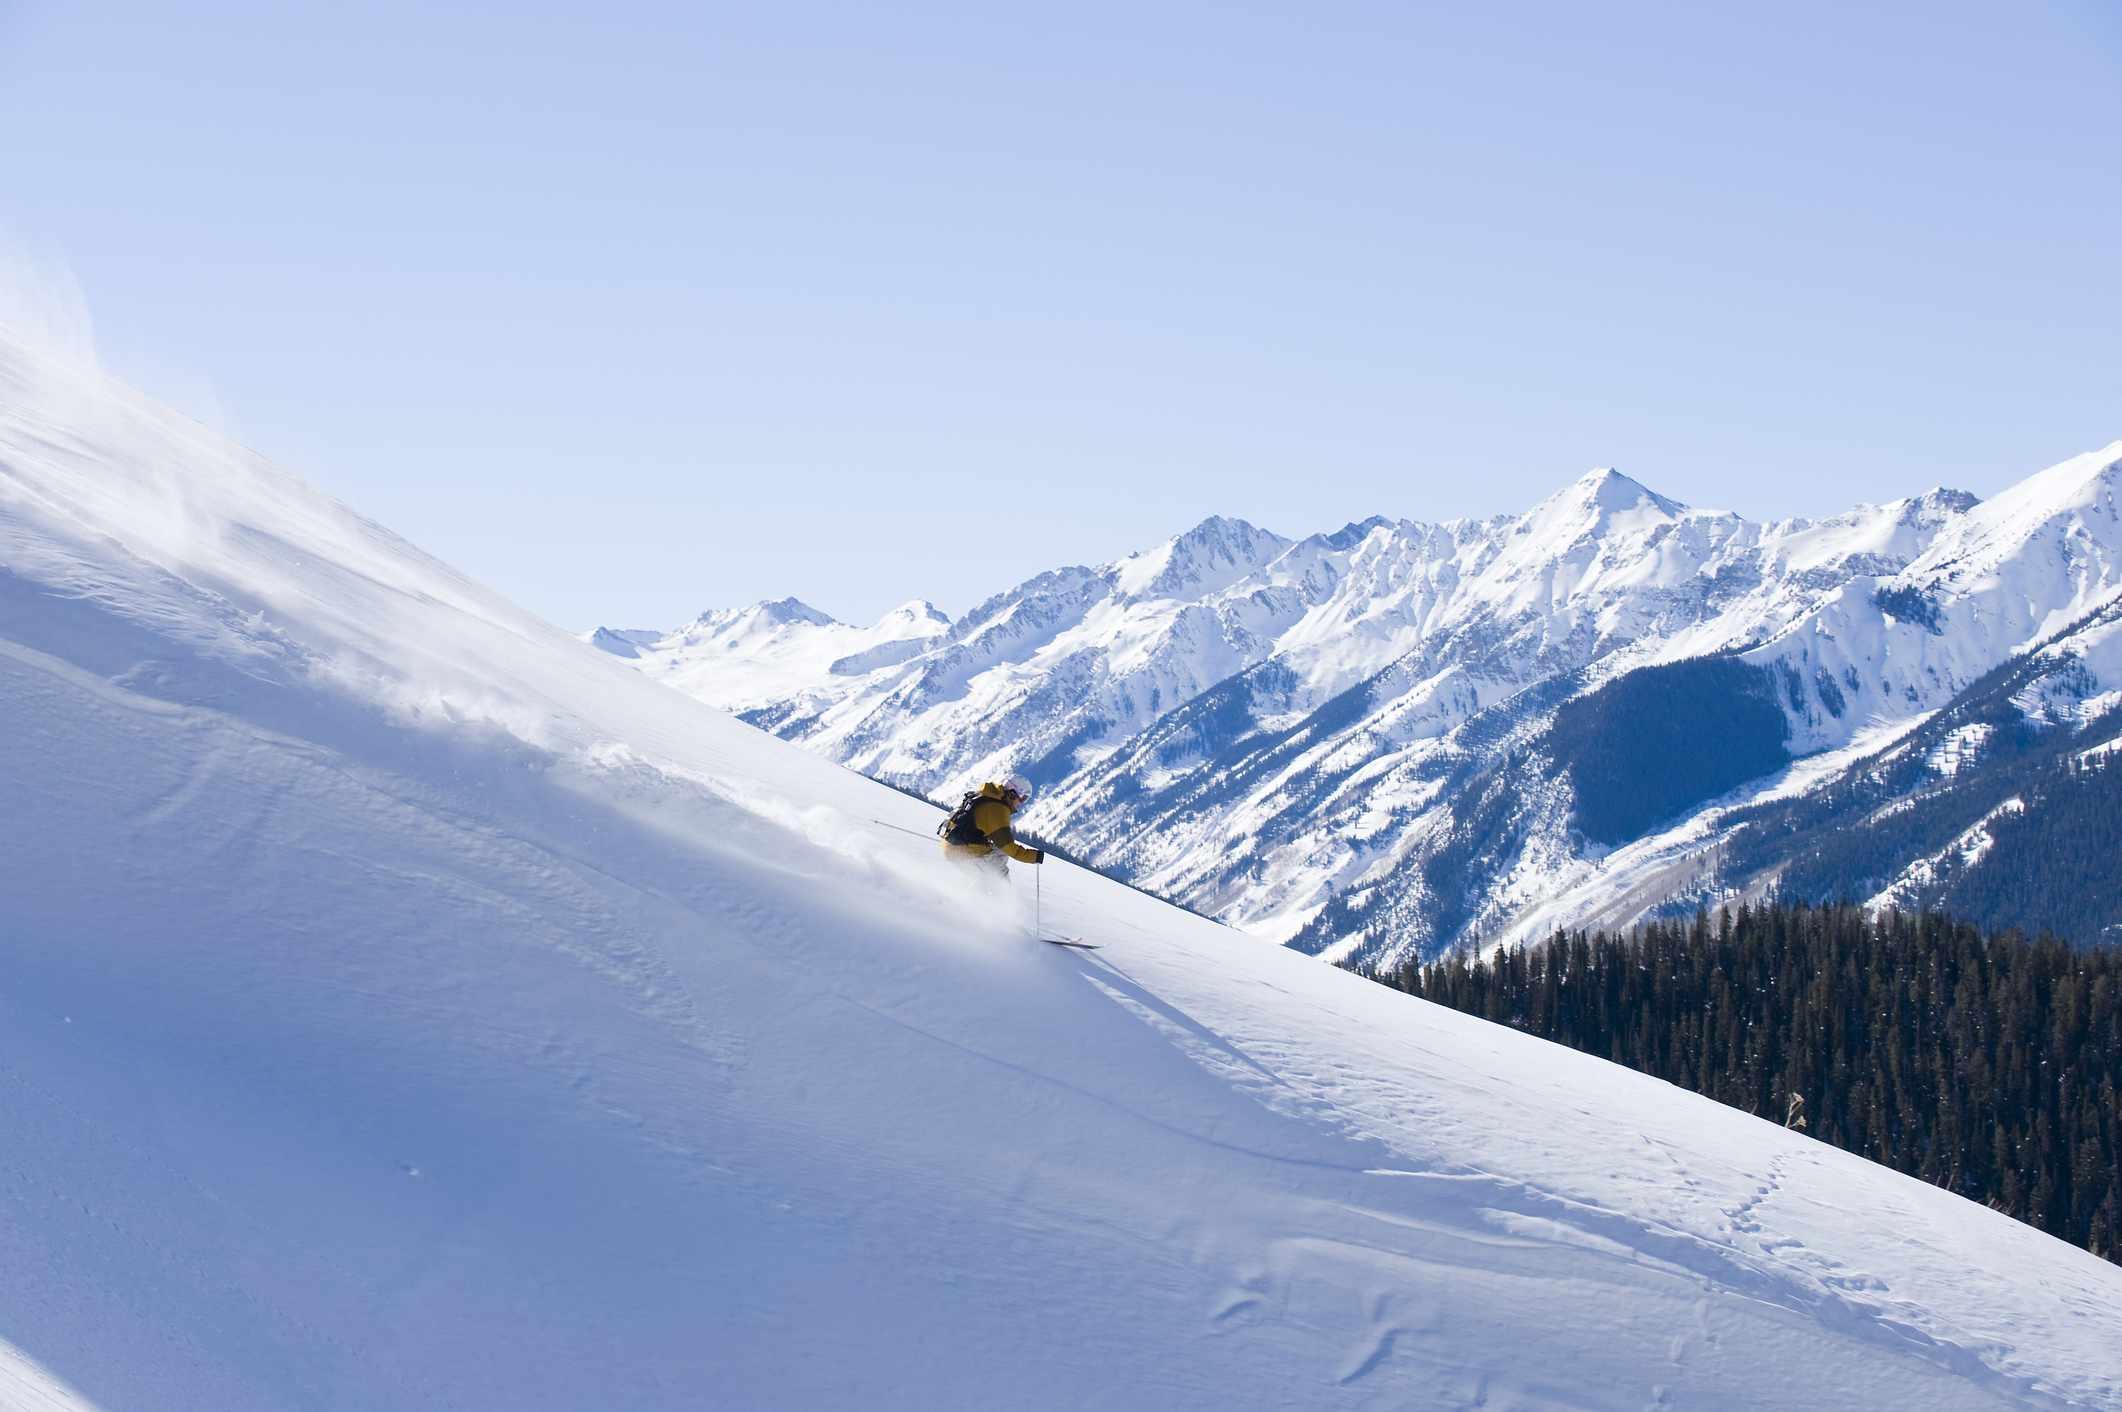 All alone skiing in Colorado